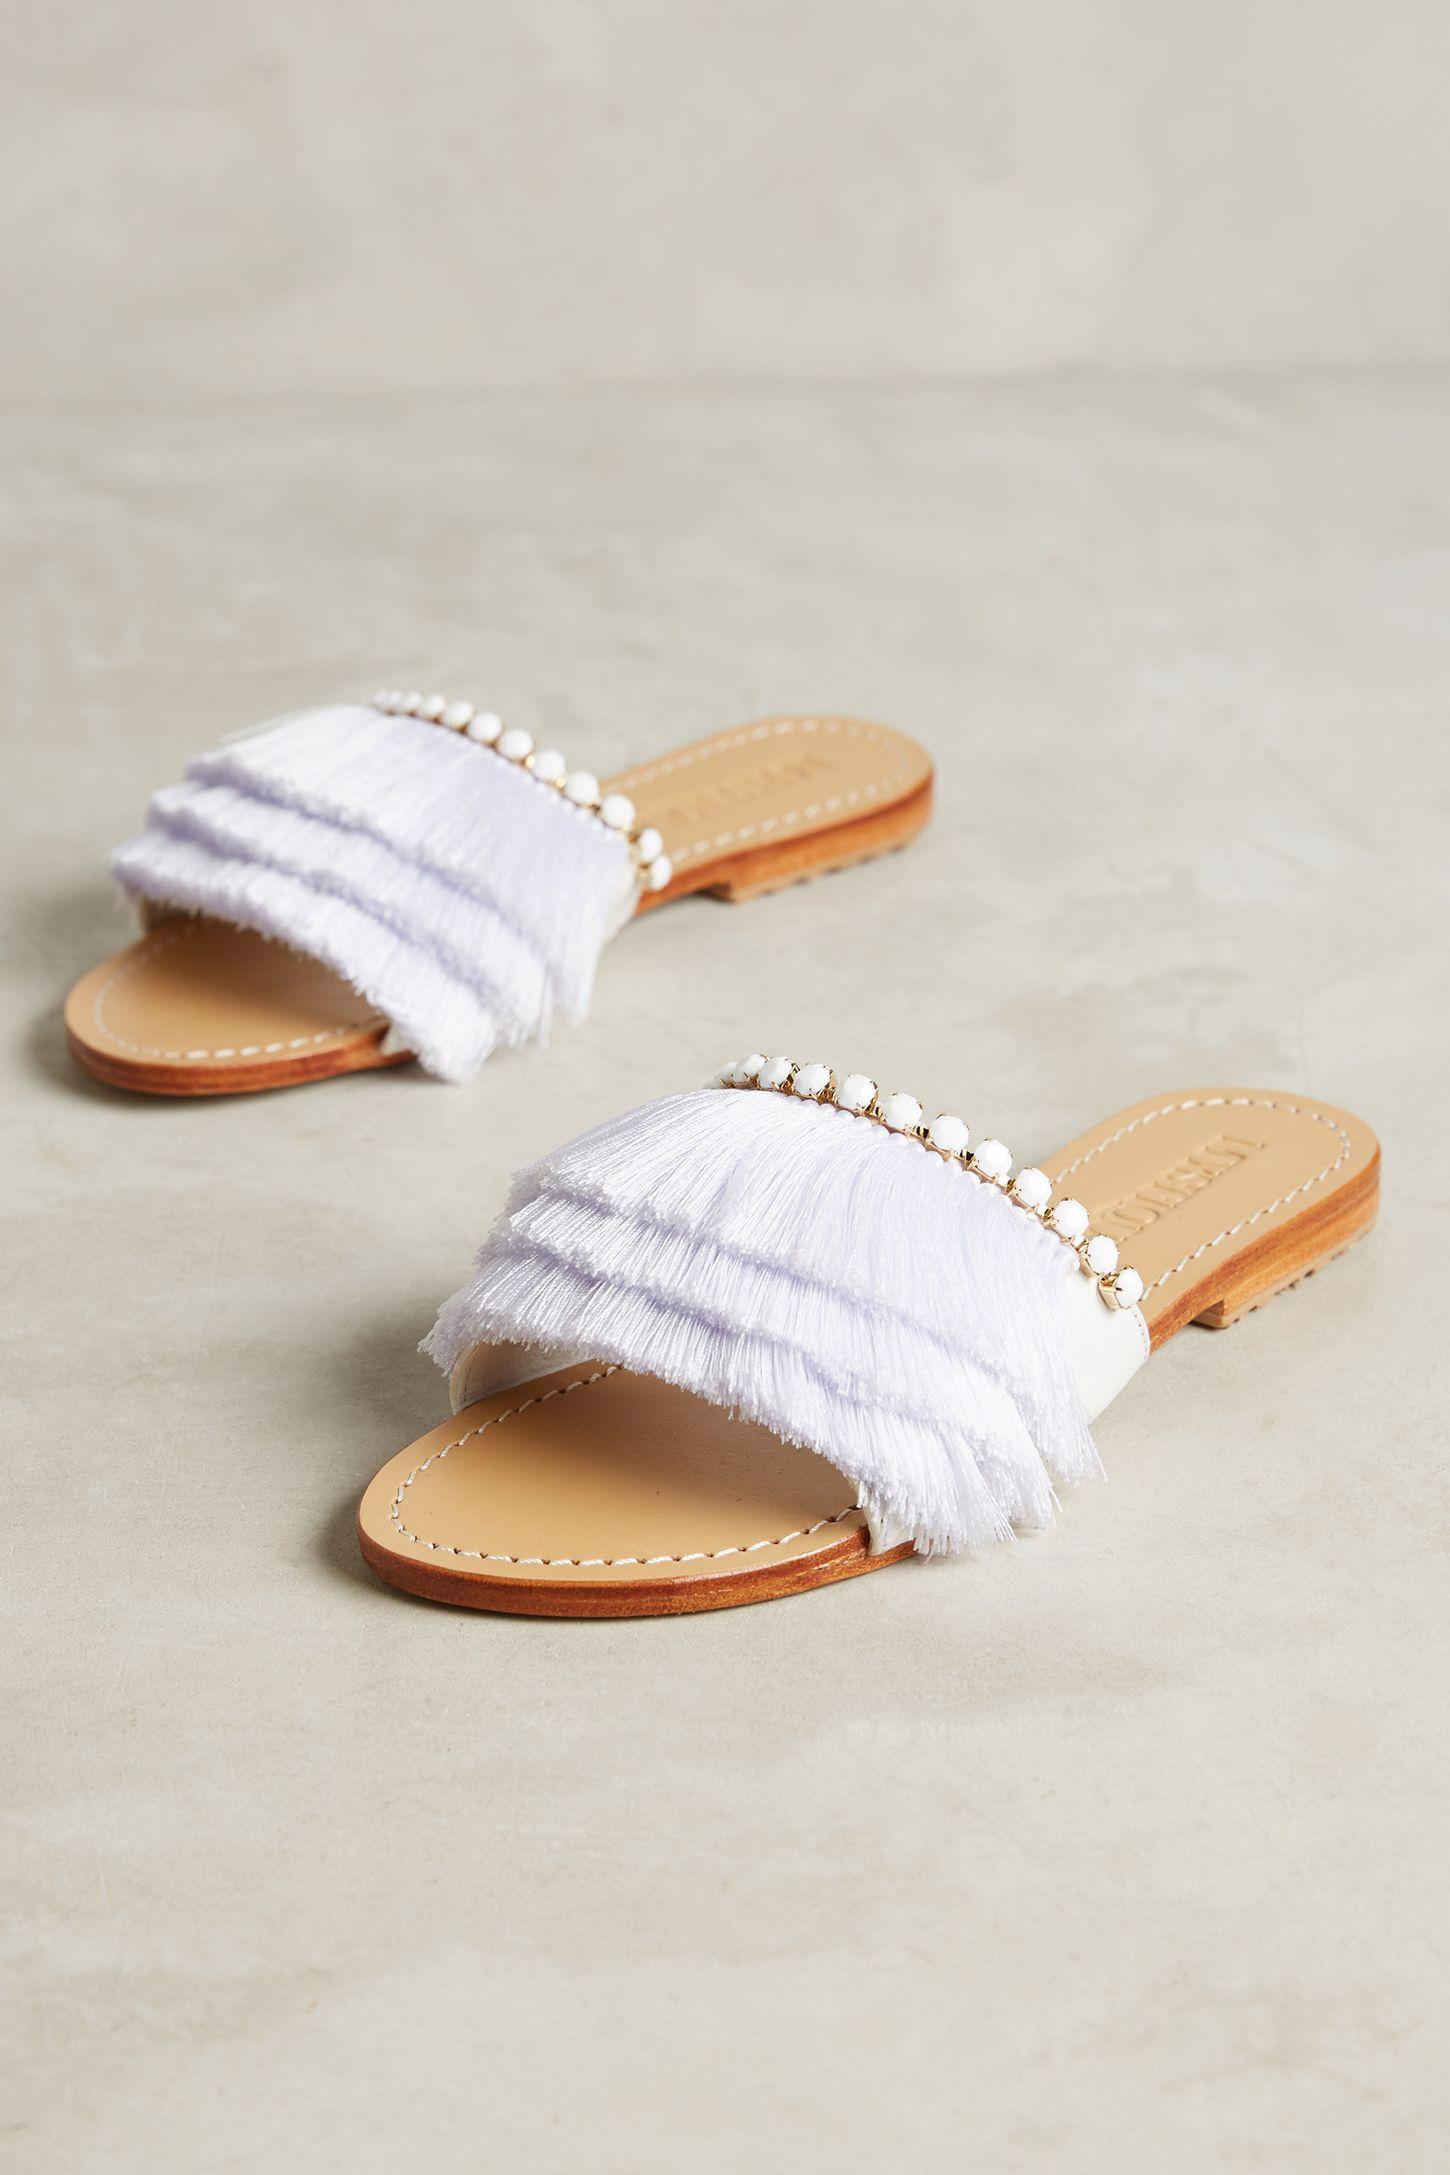 37c5c5da3633 Mystique Fringe Slide Sandals